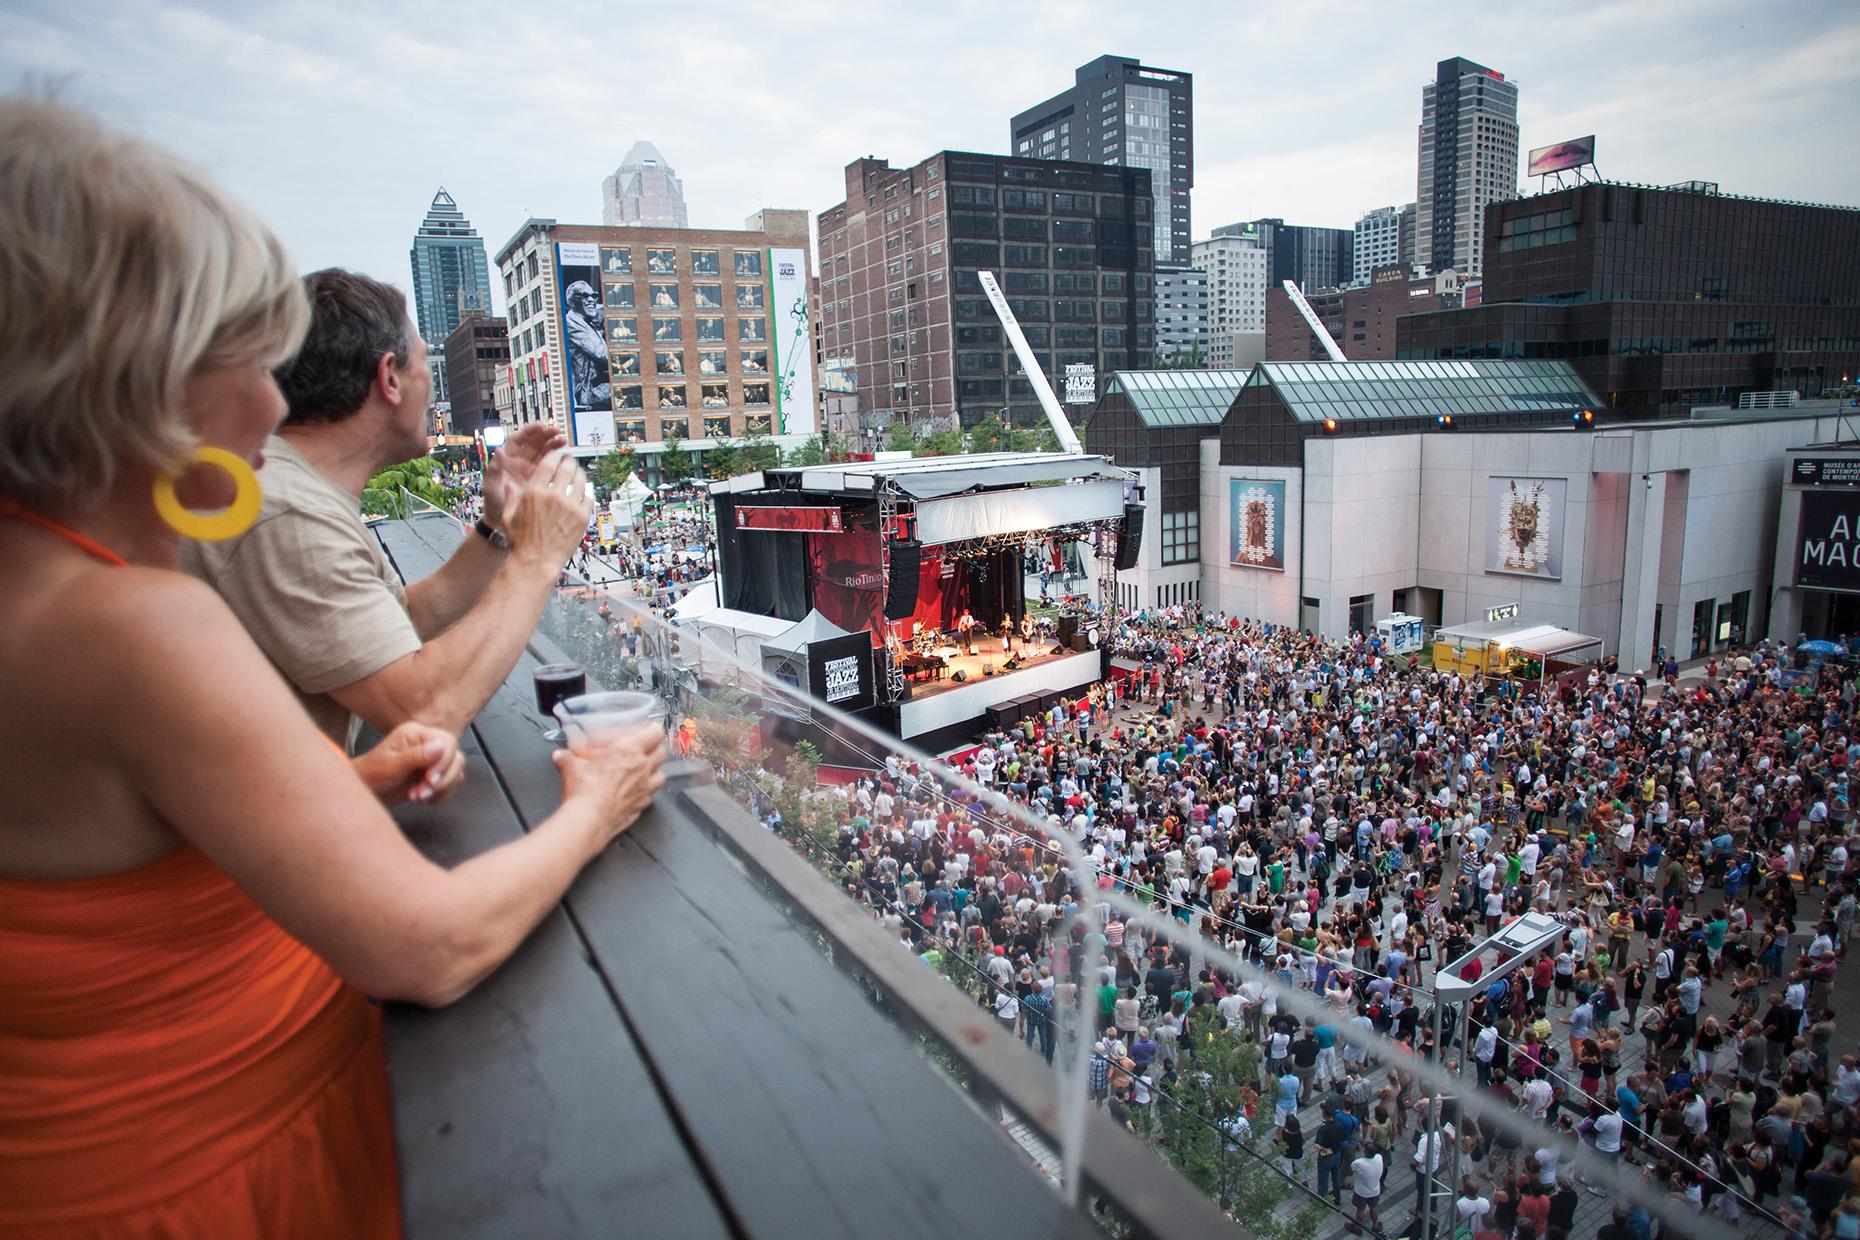 Jazz festival in Montreal